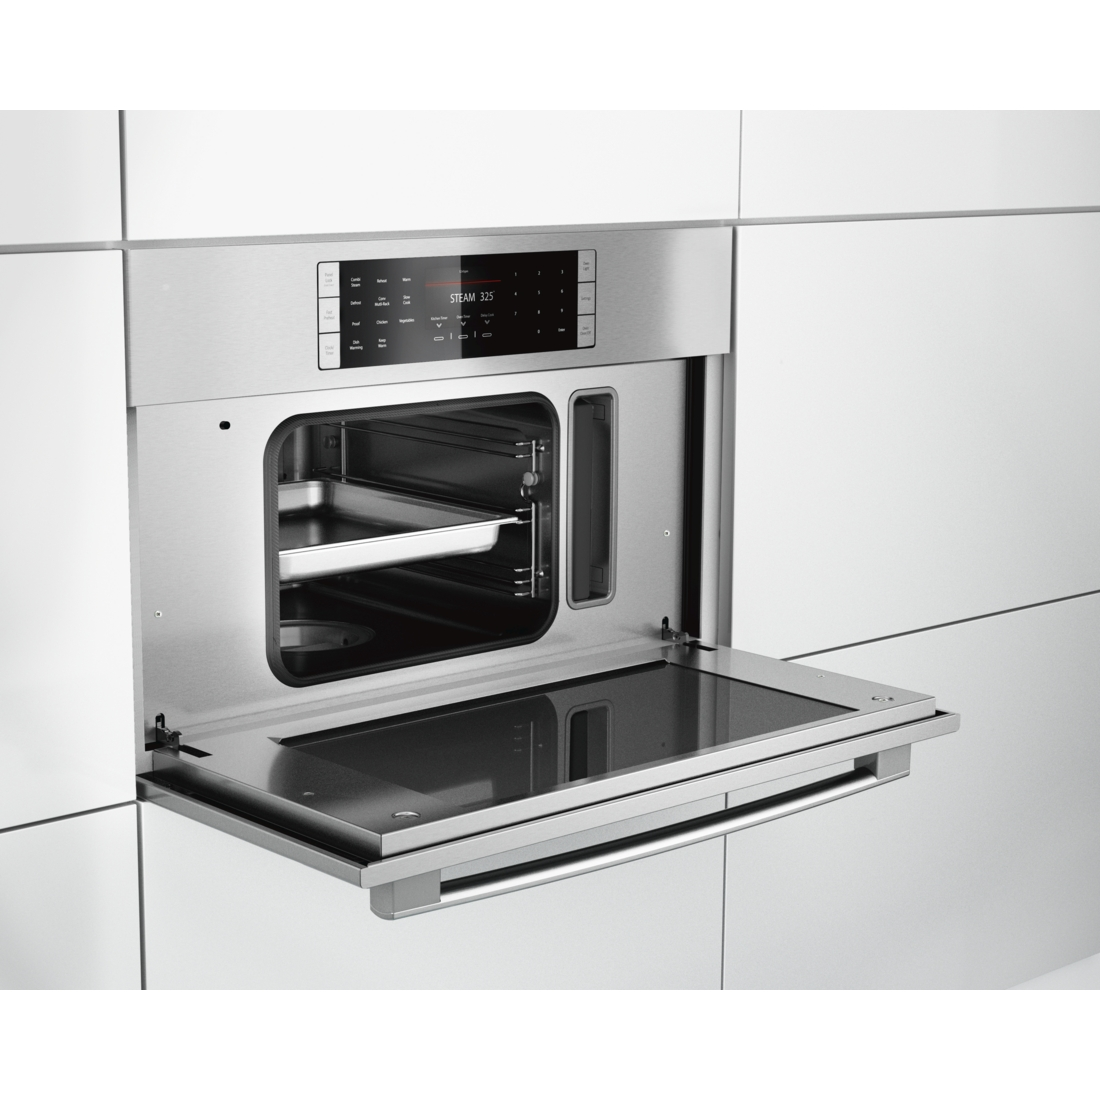 Cabanu_electrodomestico_MCSA00784092_Bosch-Steam-Oven-HSLP451UC-INTERIOR-Door-Open_def.jpg